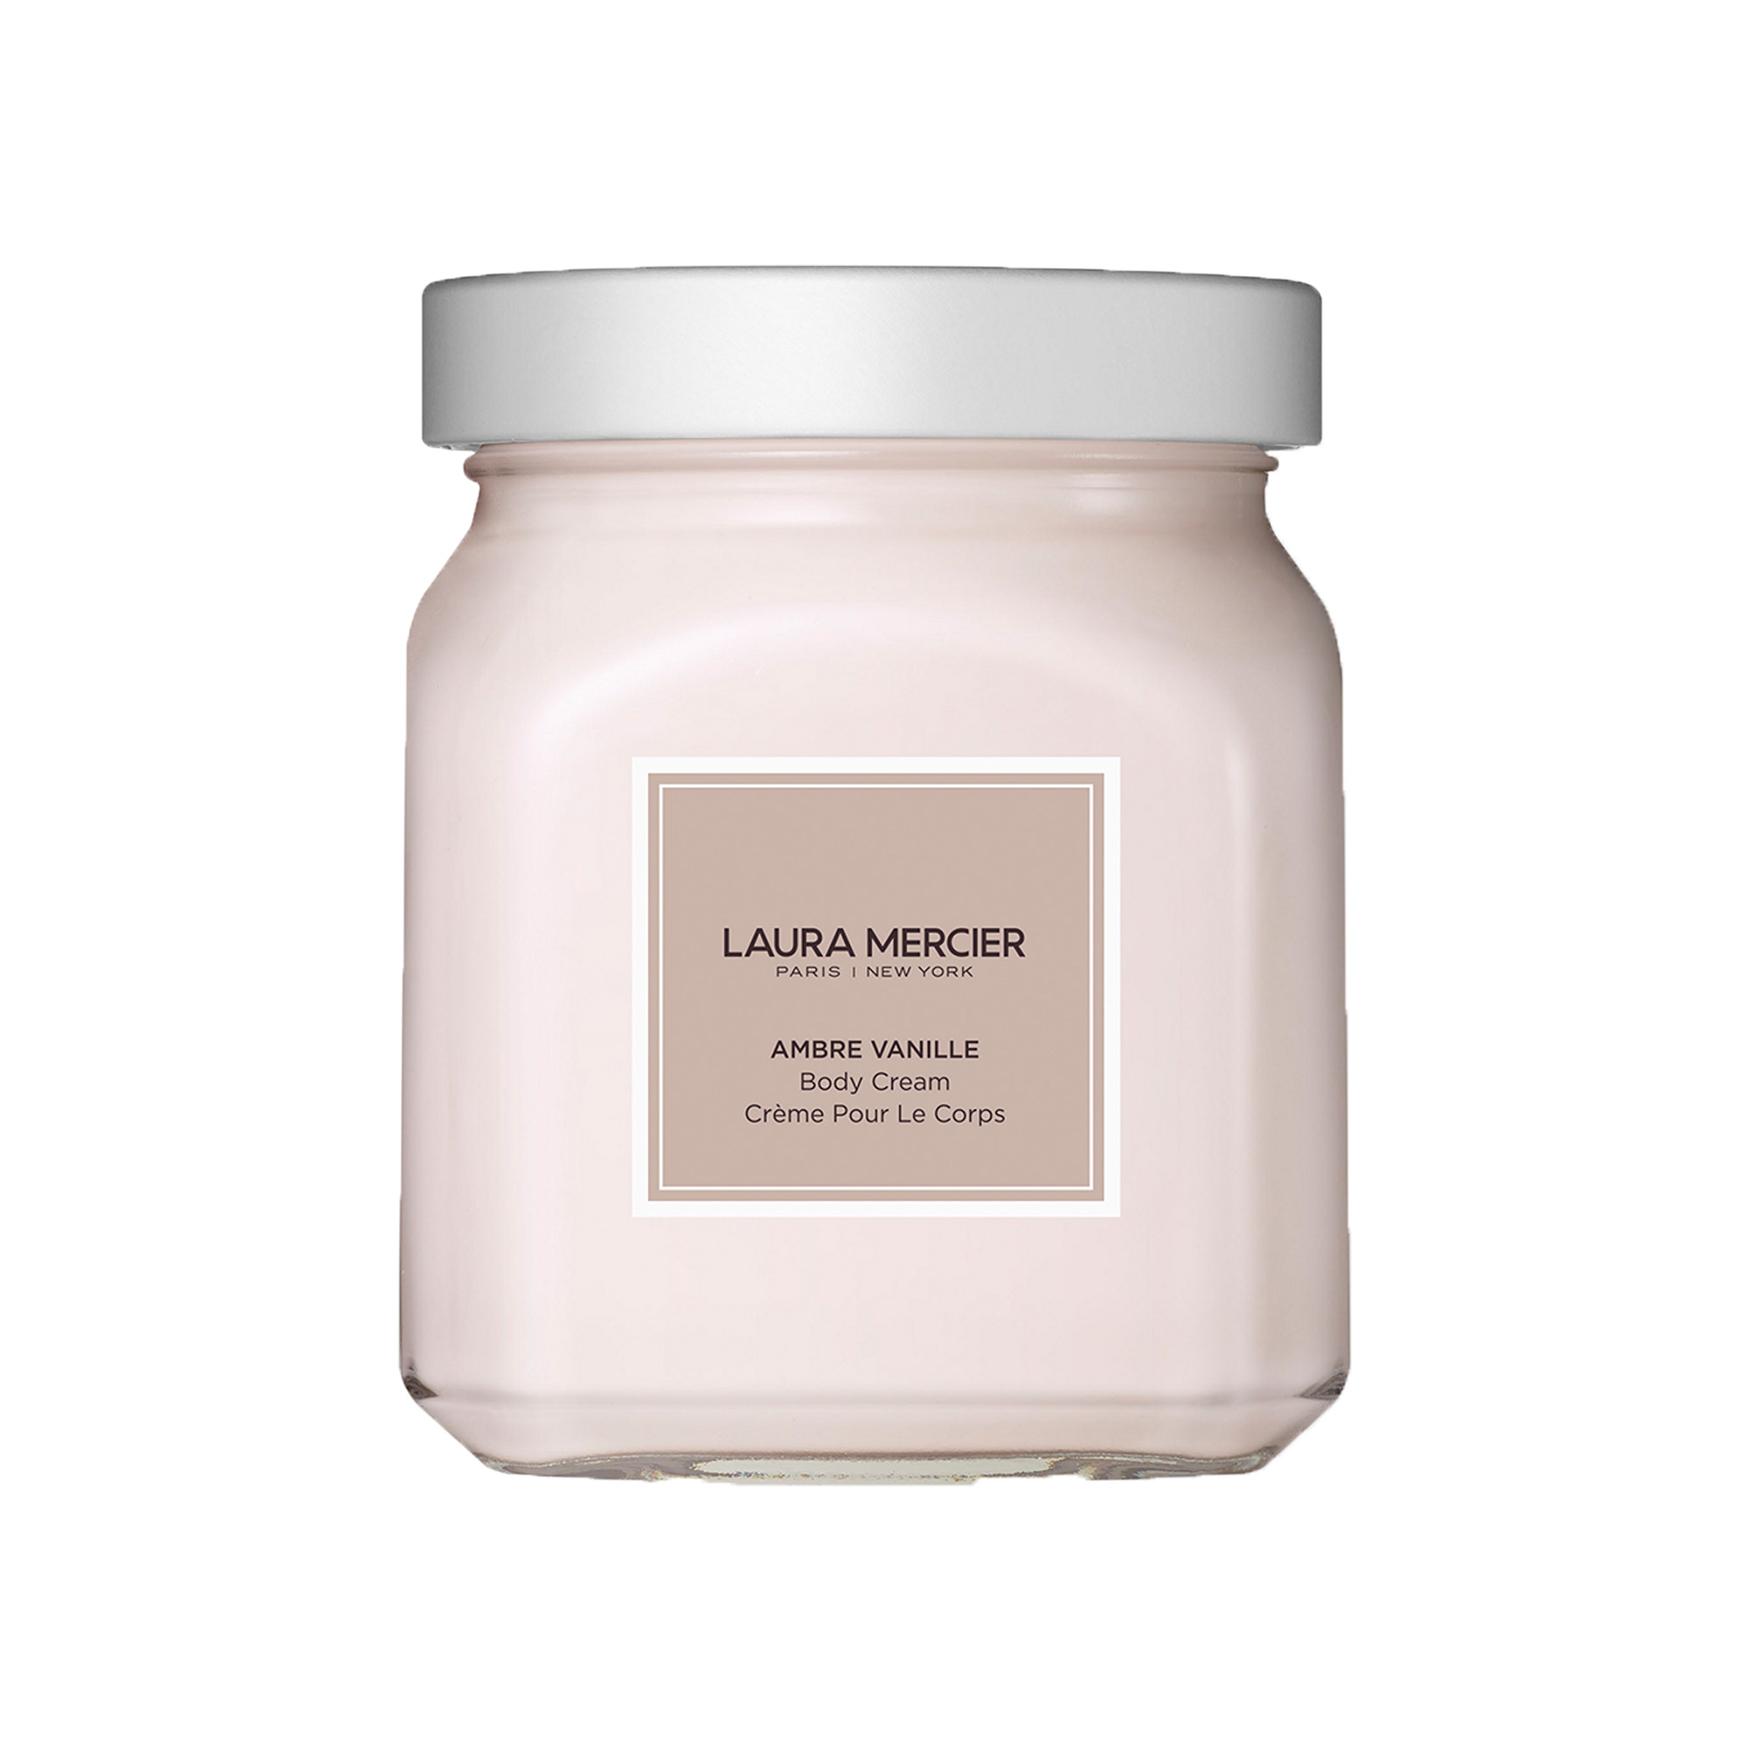 Laura Mercier Ambre Vanille Hand Cream | Space NK